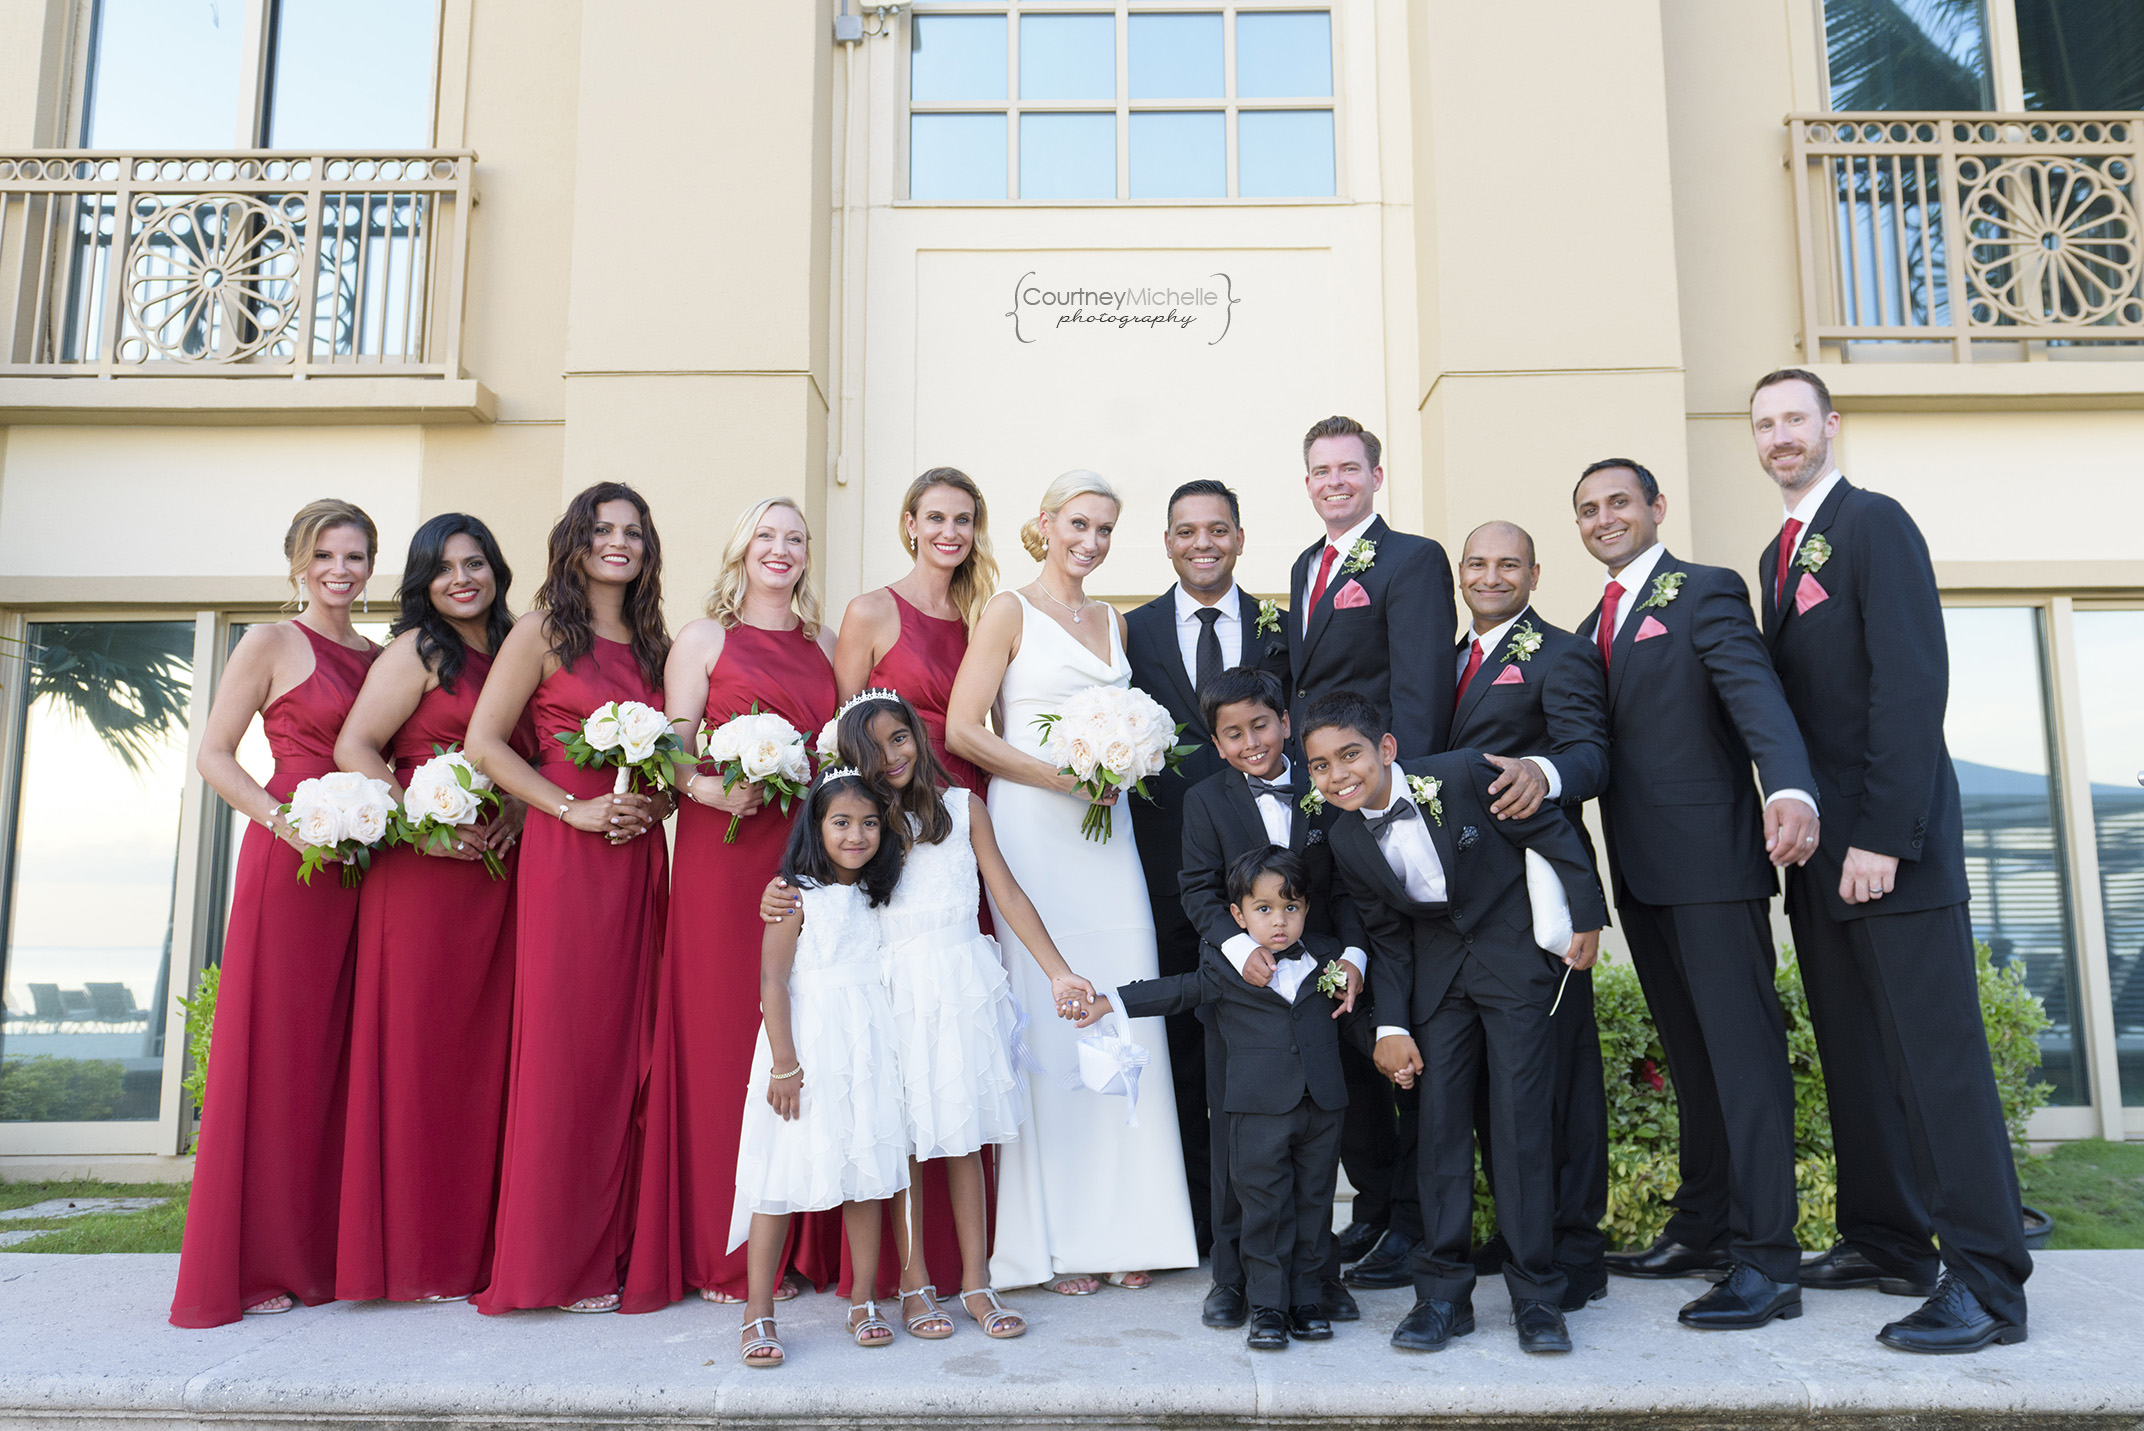 wedding-party-grand-cayman-beach-wedding-photography-by-courtney-laper©CopyrightCMP-LeaAnneRaj-7860.jpg